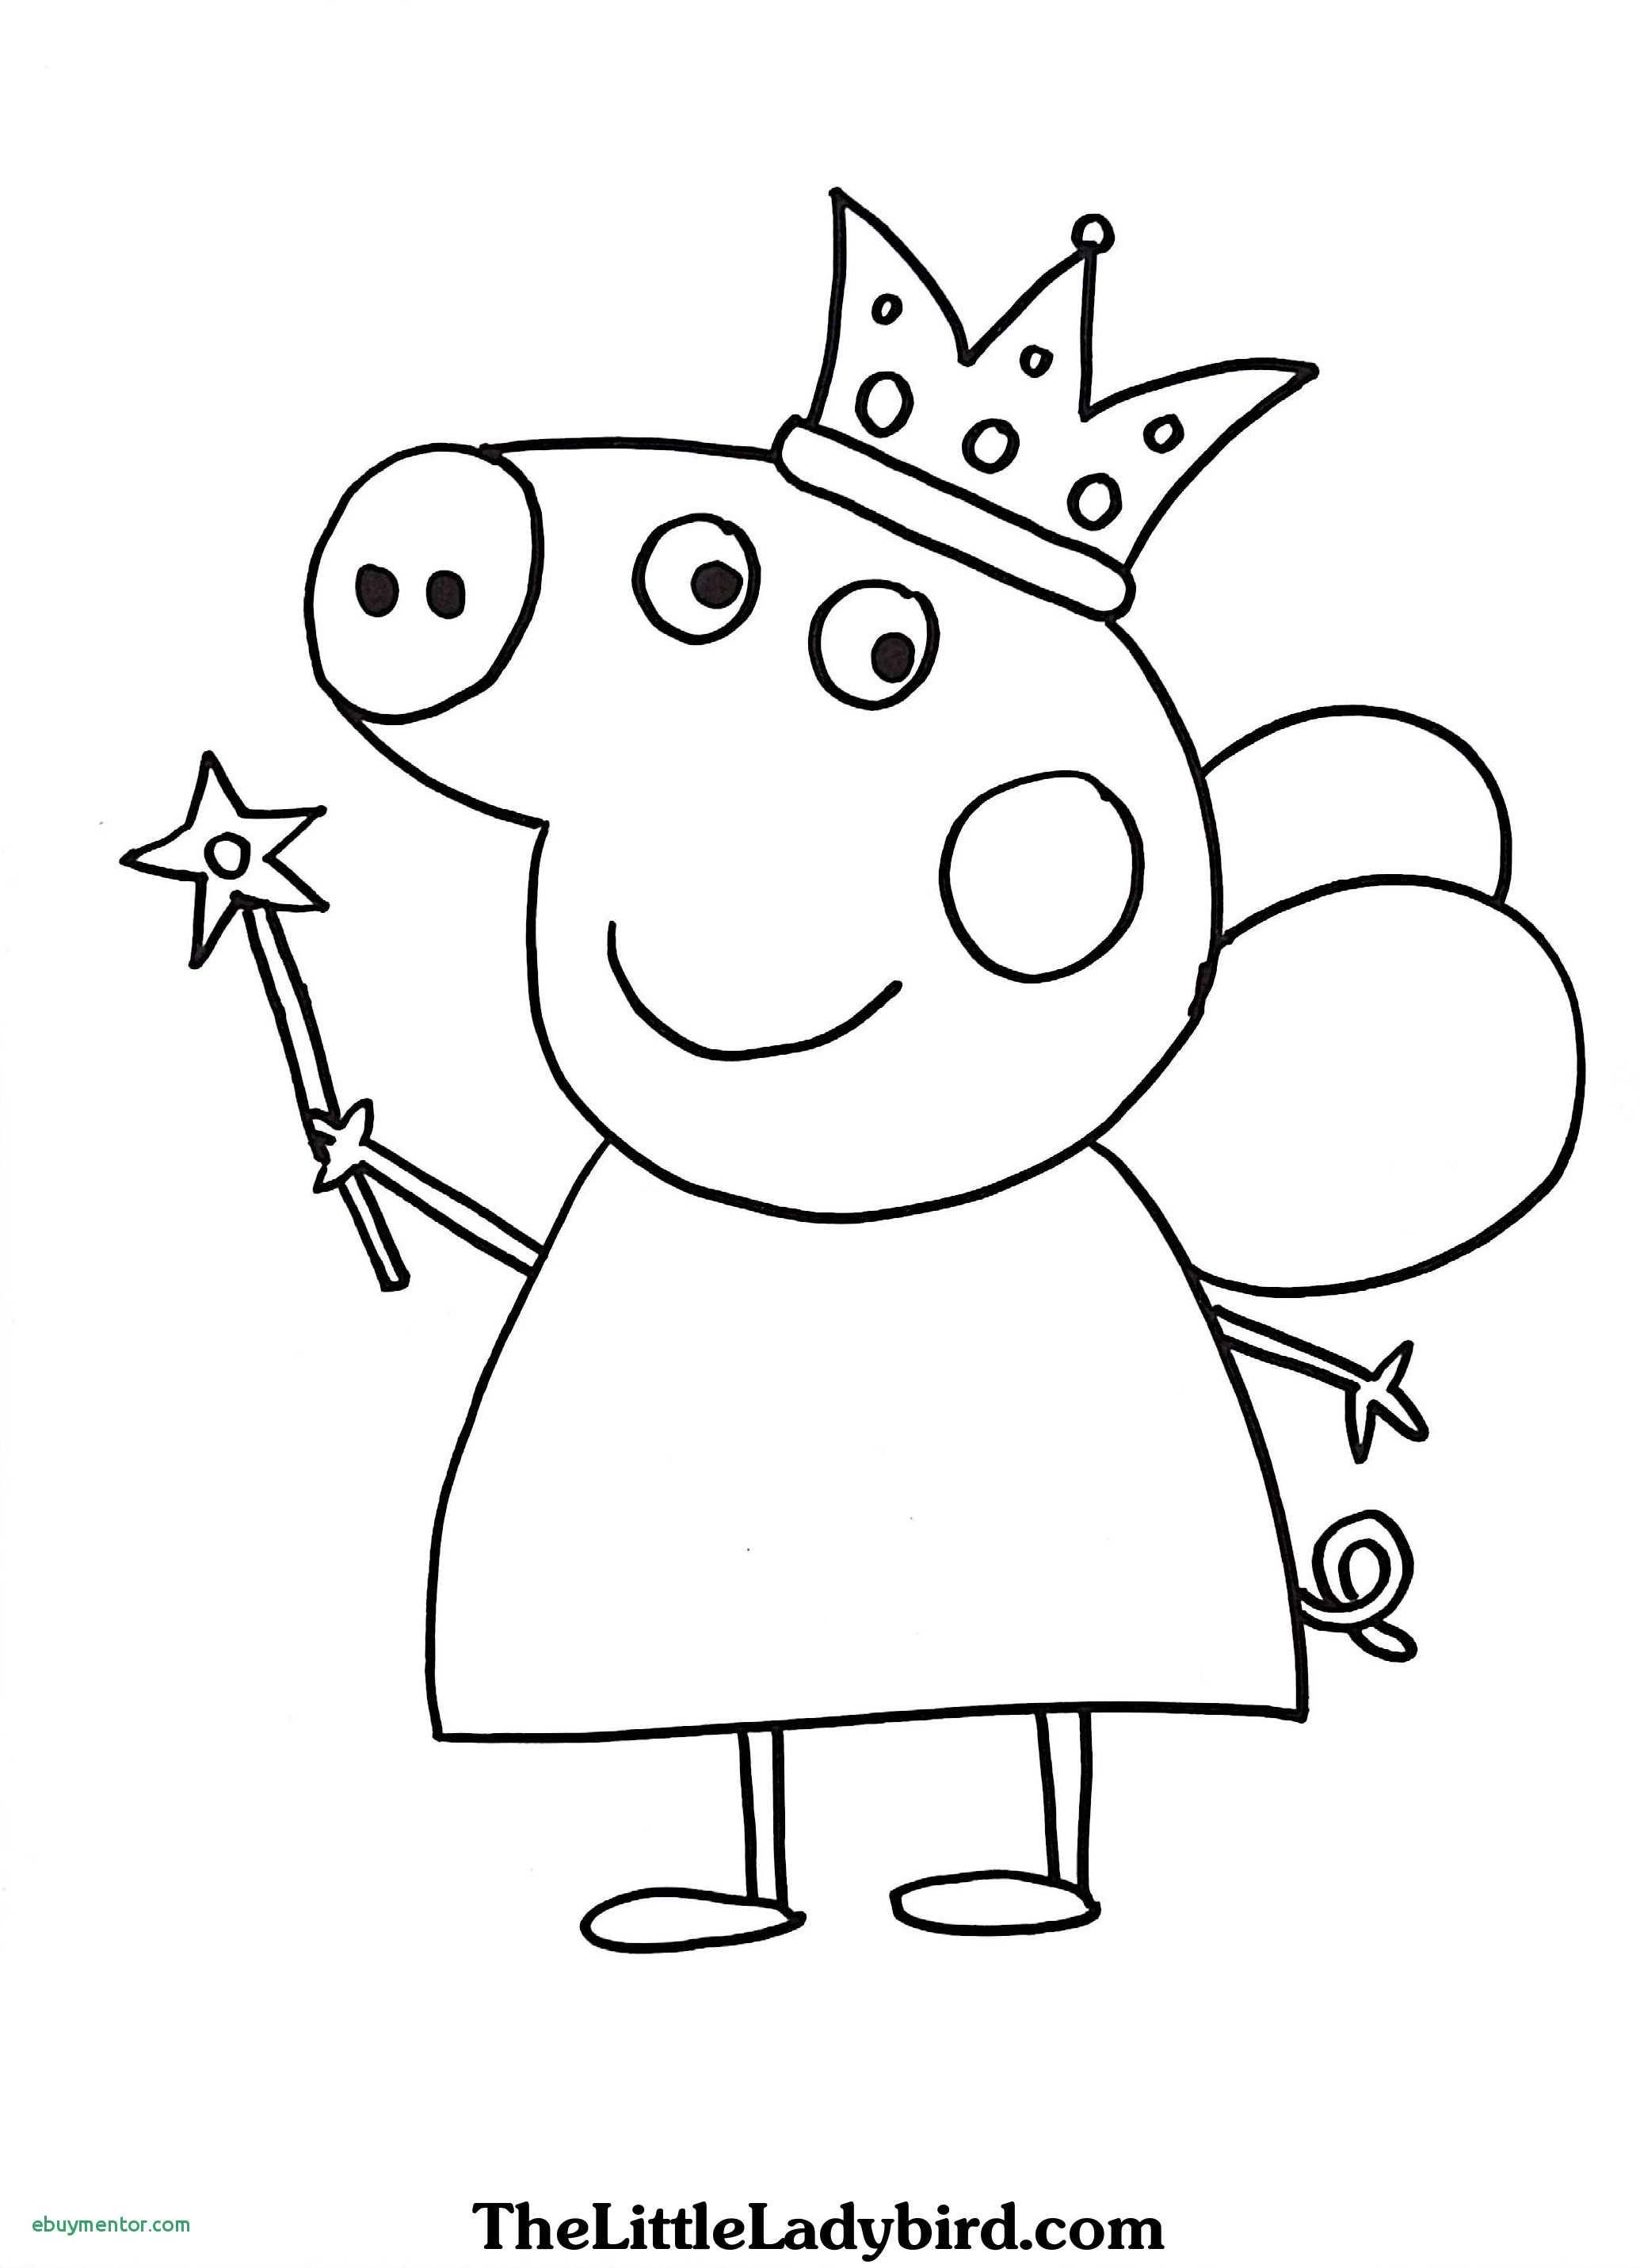 Candy Cat 16 Candy Cat Peppa Pig Character Baby Alexander Coloring From Peppa Pig Princess Clipar Dibujo De Peppa Pig Peppa Pig Para Colorear Peppa Para Pintar